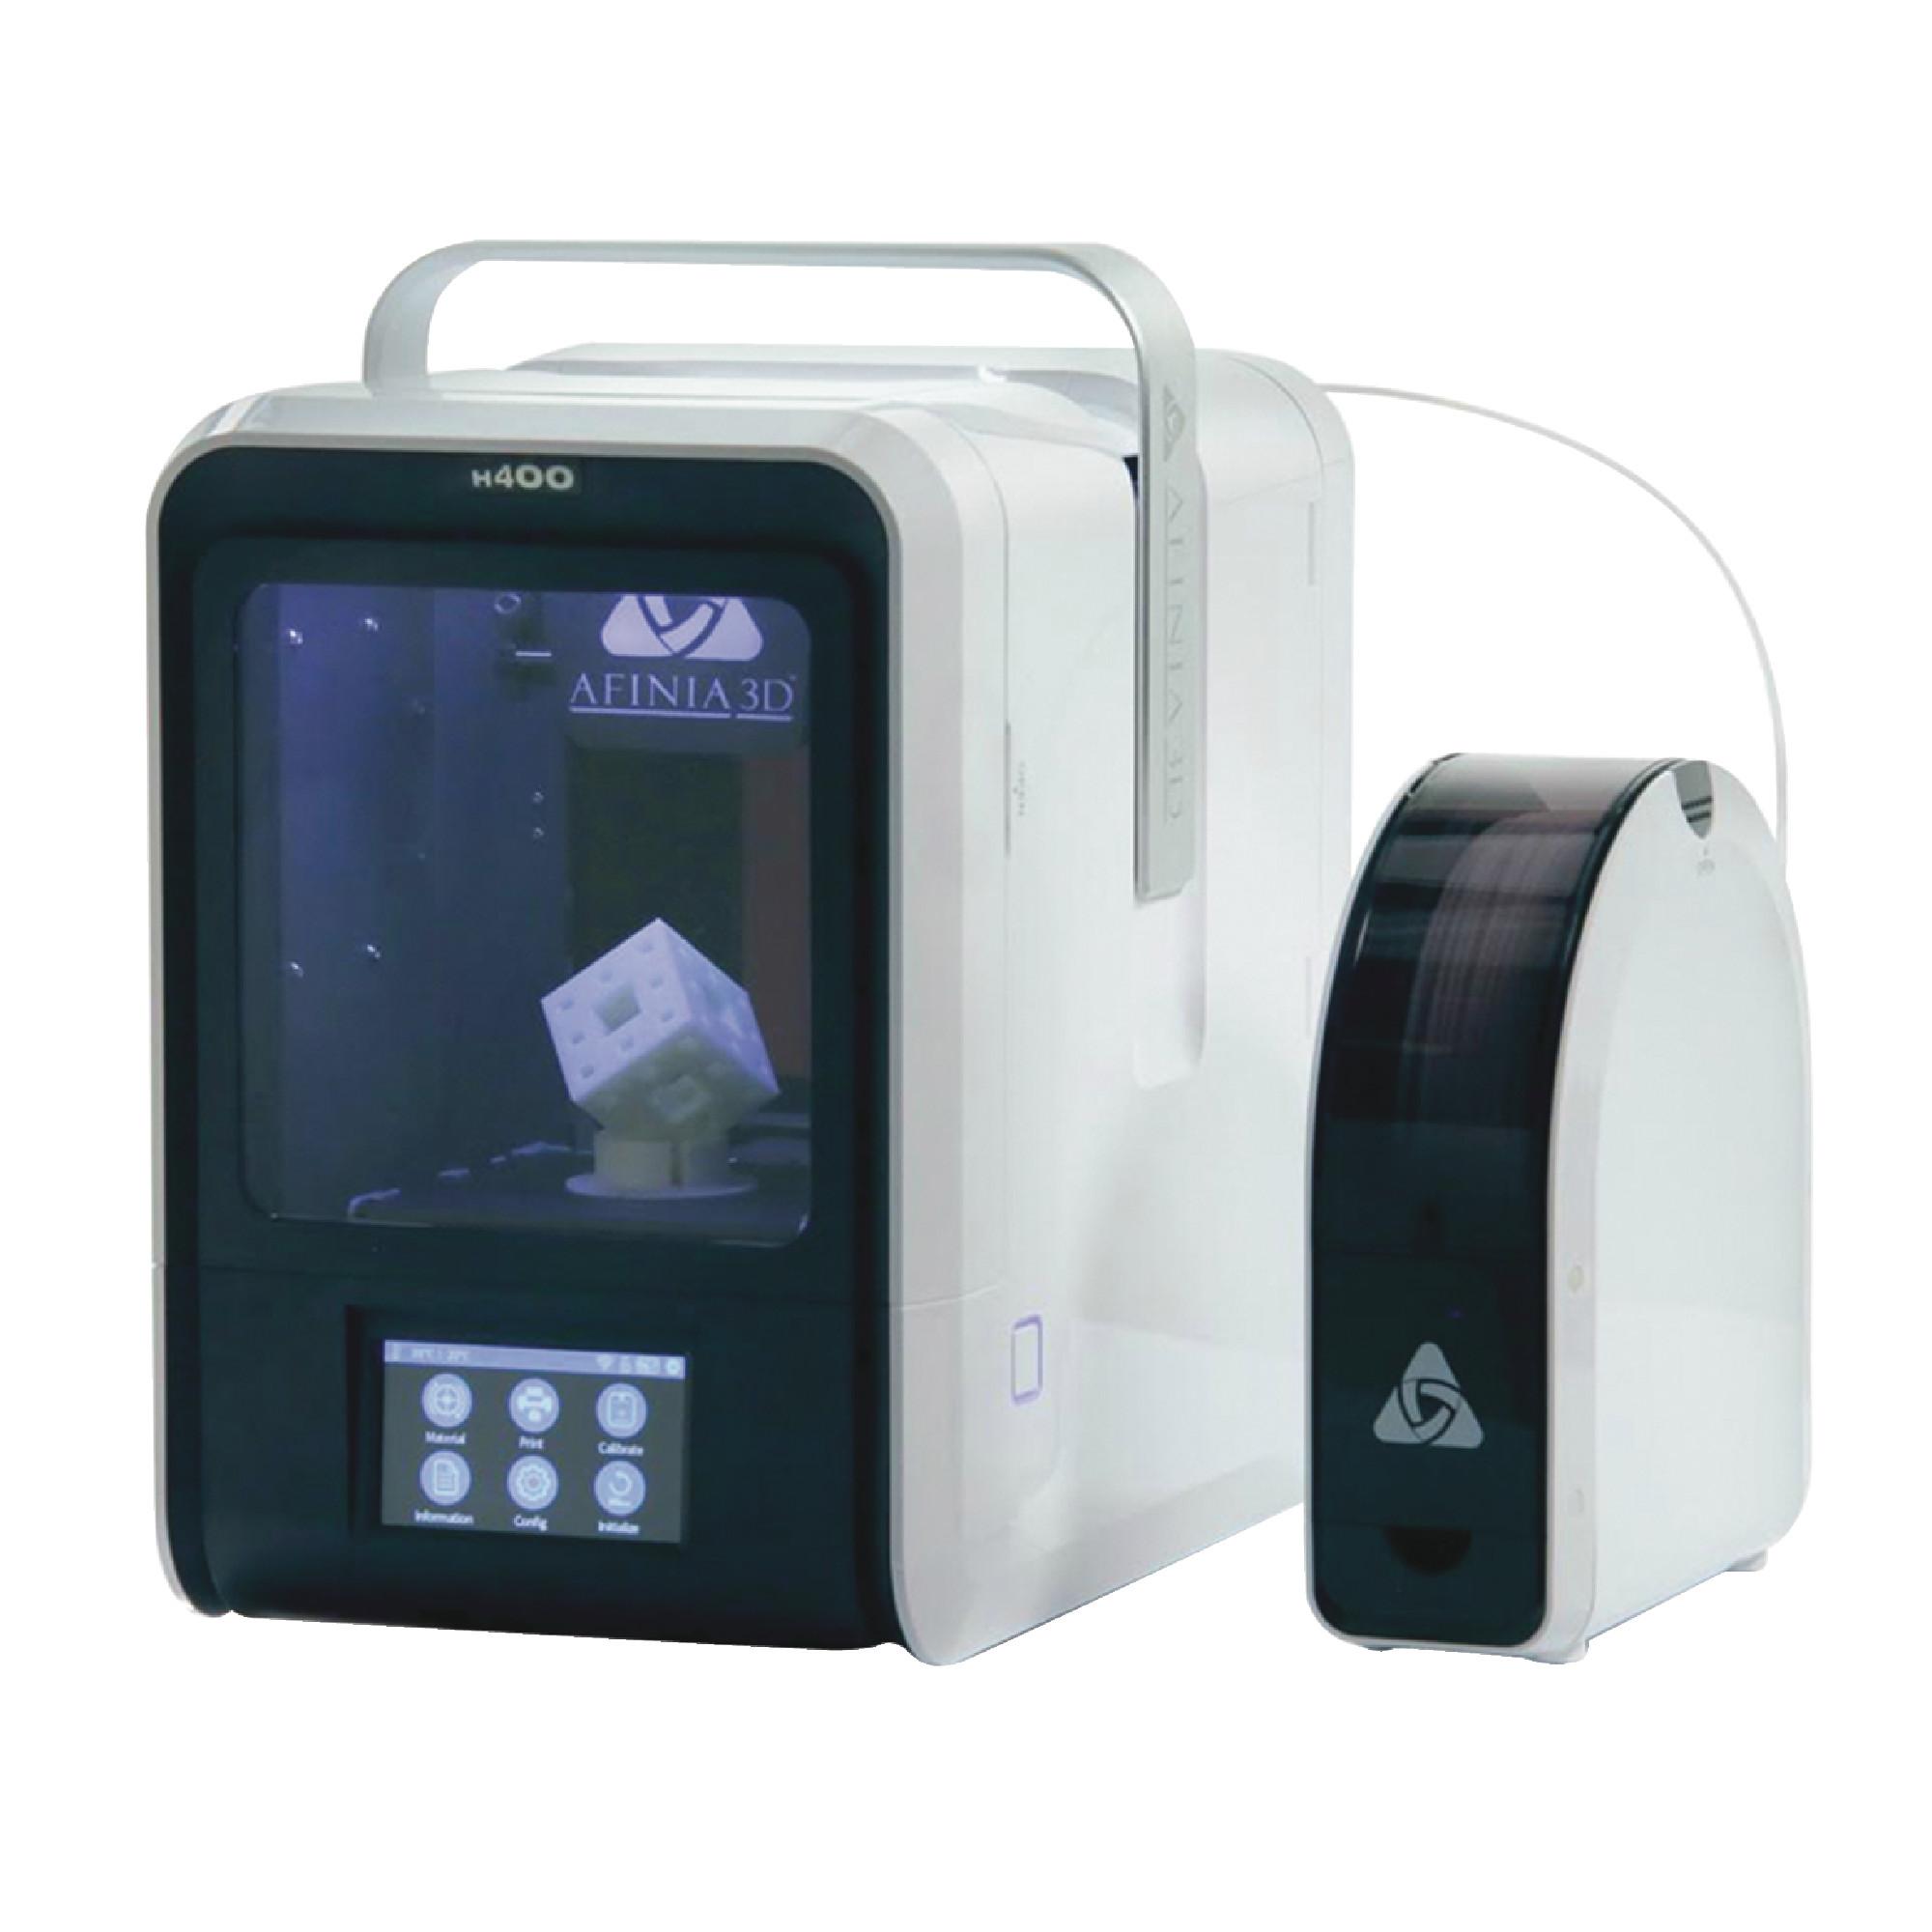 H400+ Desktop 3D Printer